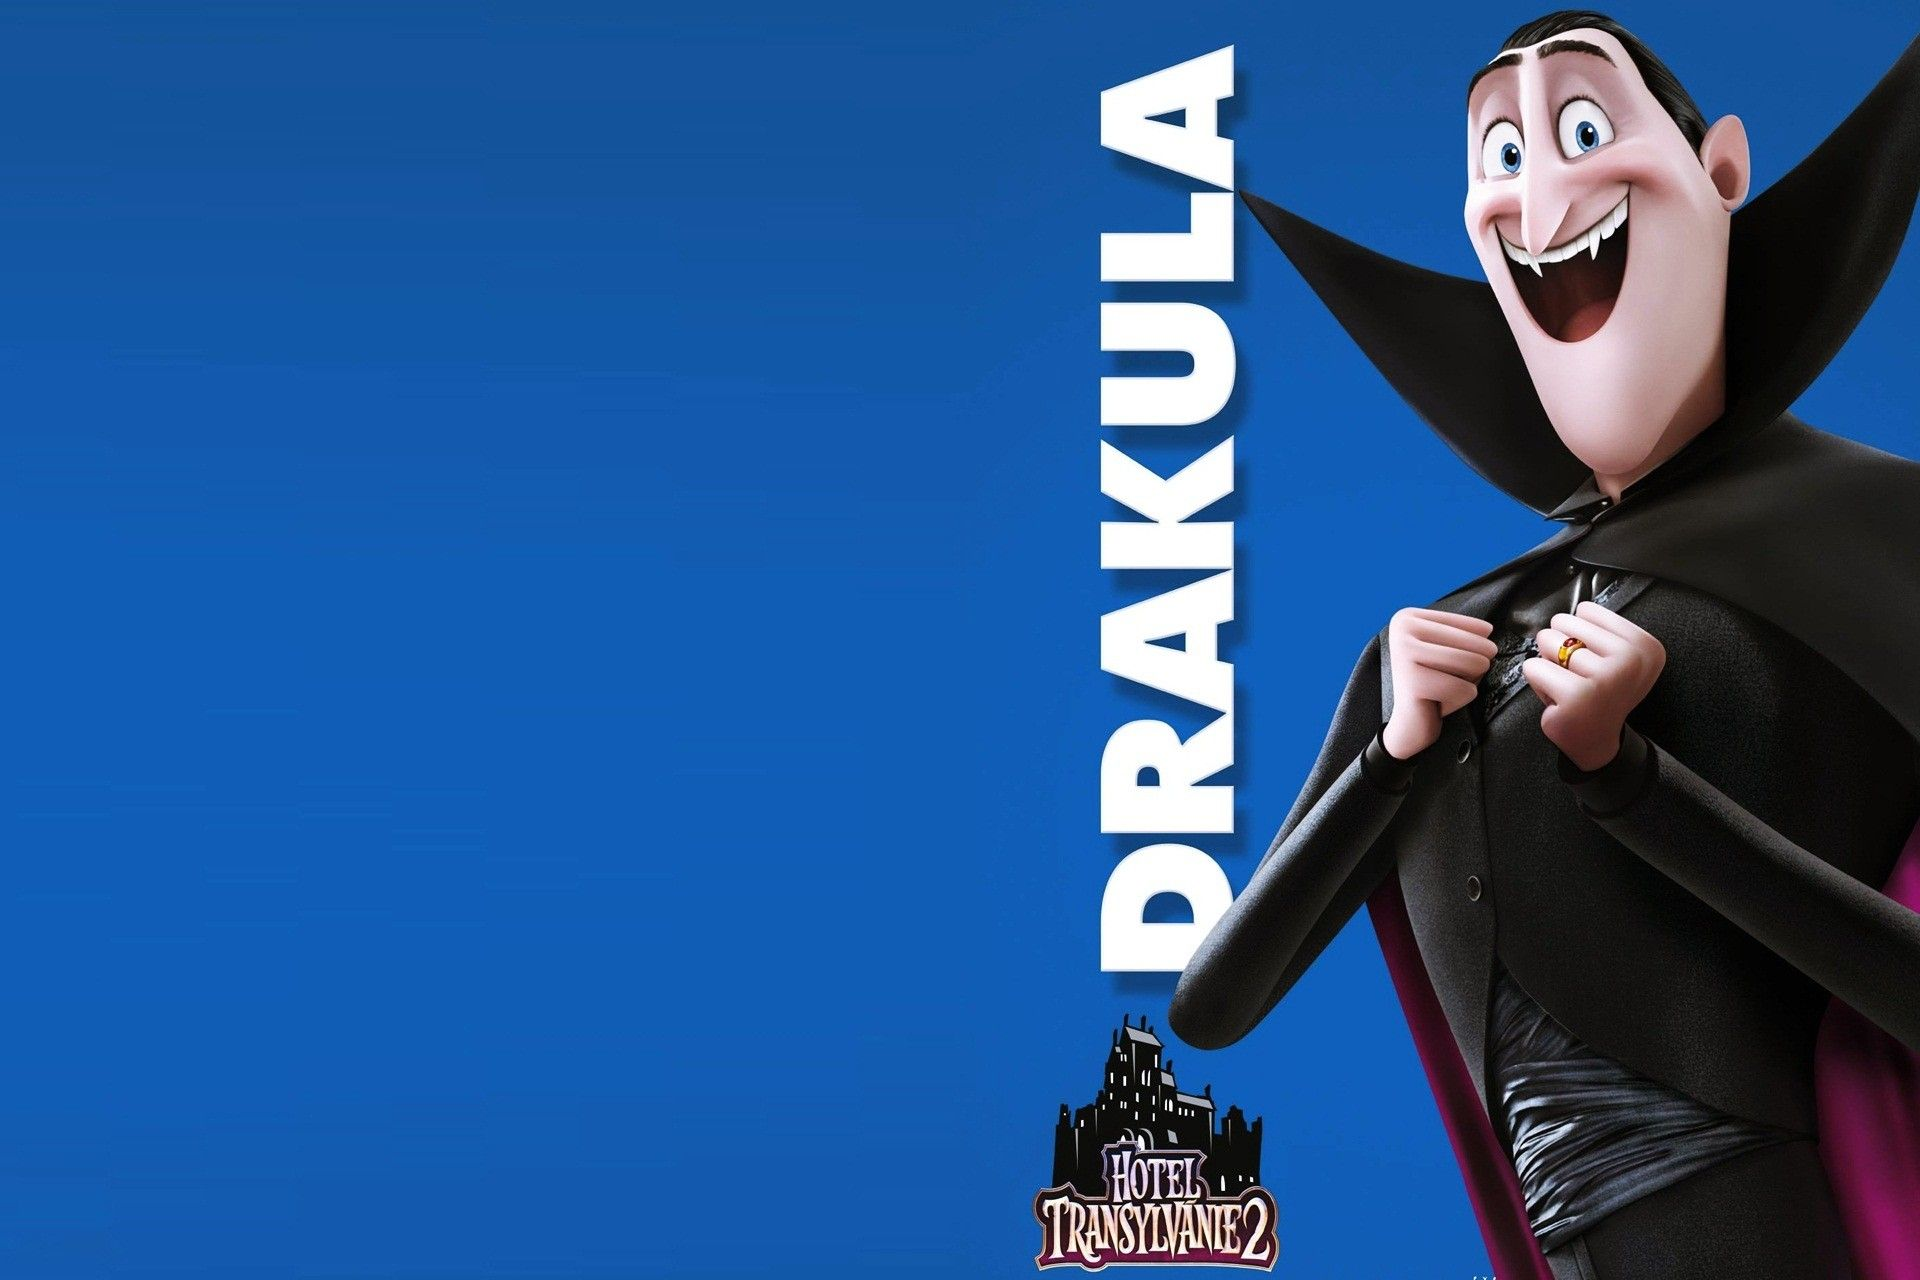 Dracula - Hotel Transylvania 2 Hd Wallpaper Knut Design